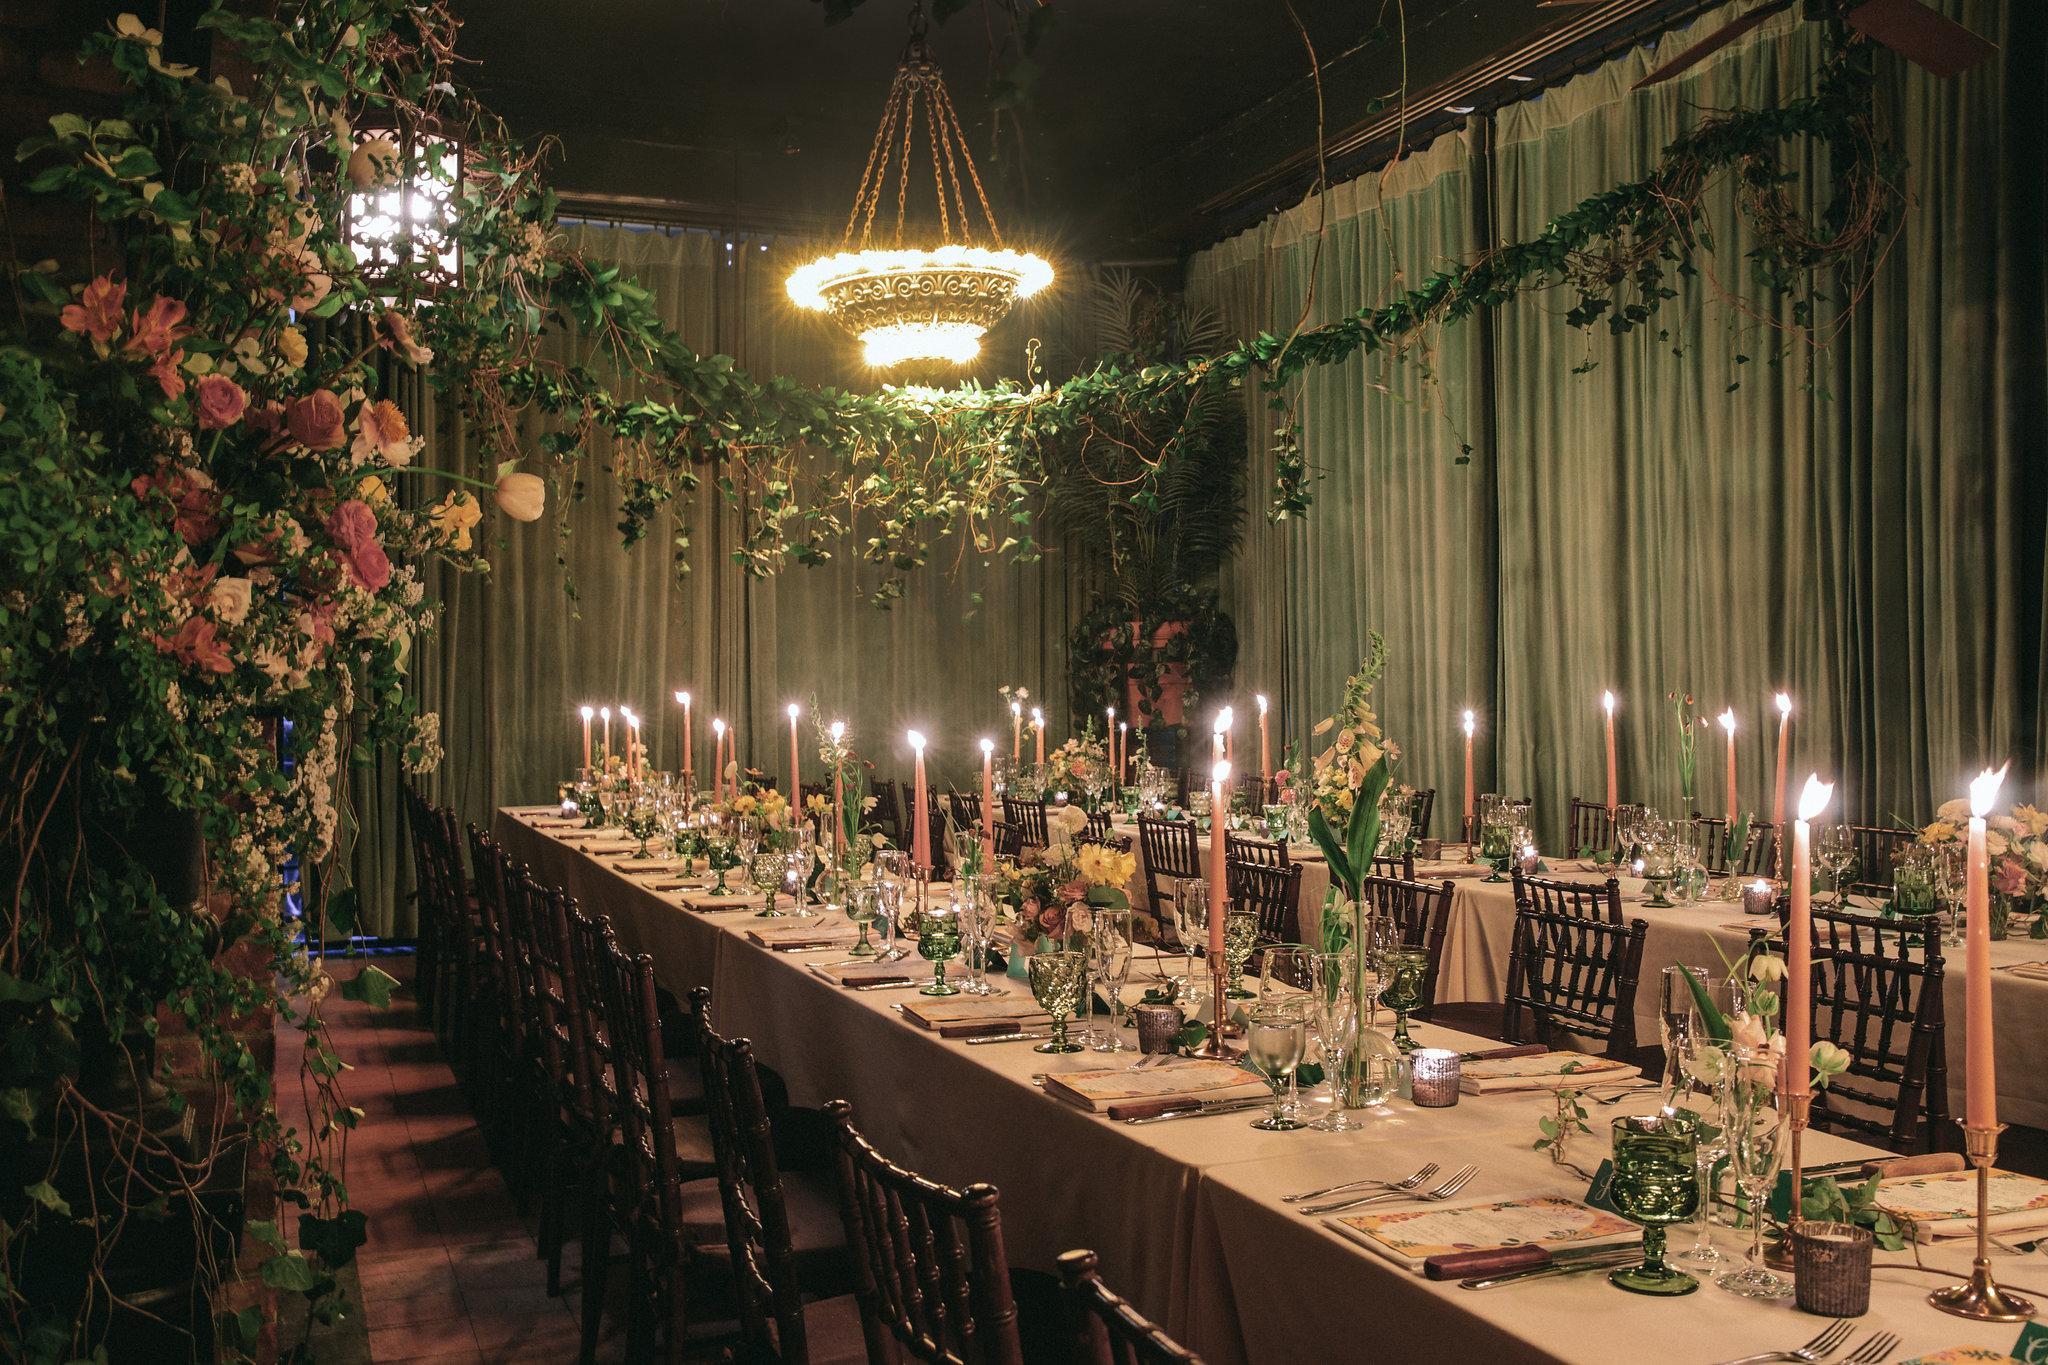 bowery-hotel-wedding-jove-meyer-events-041.jpg